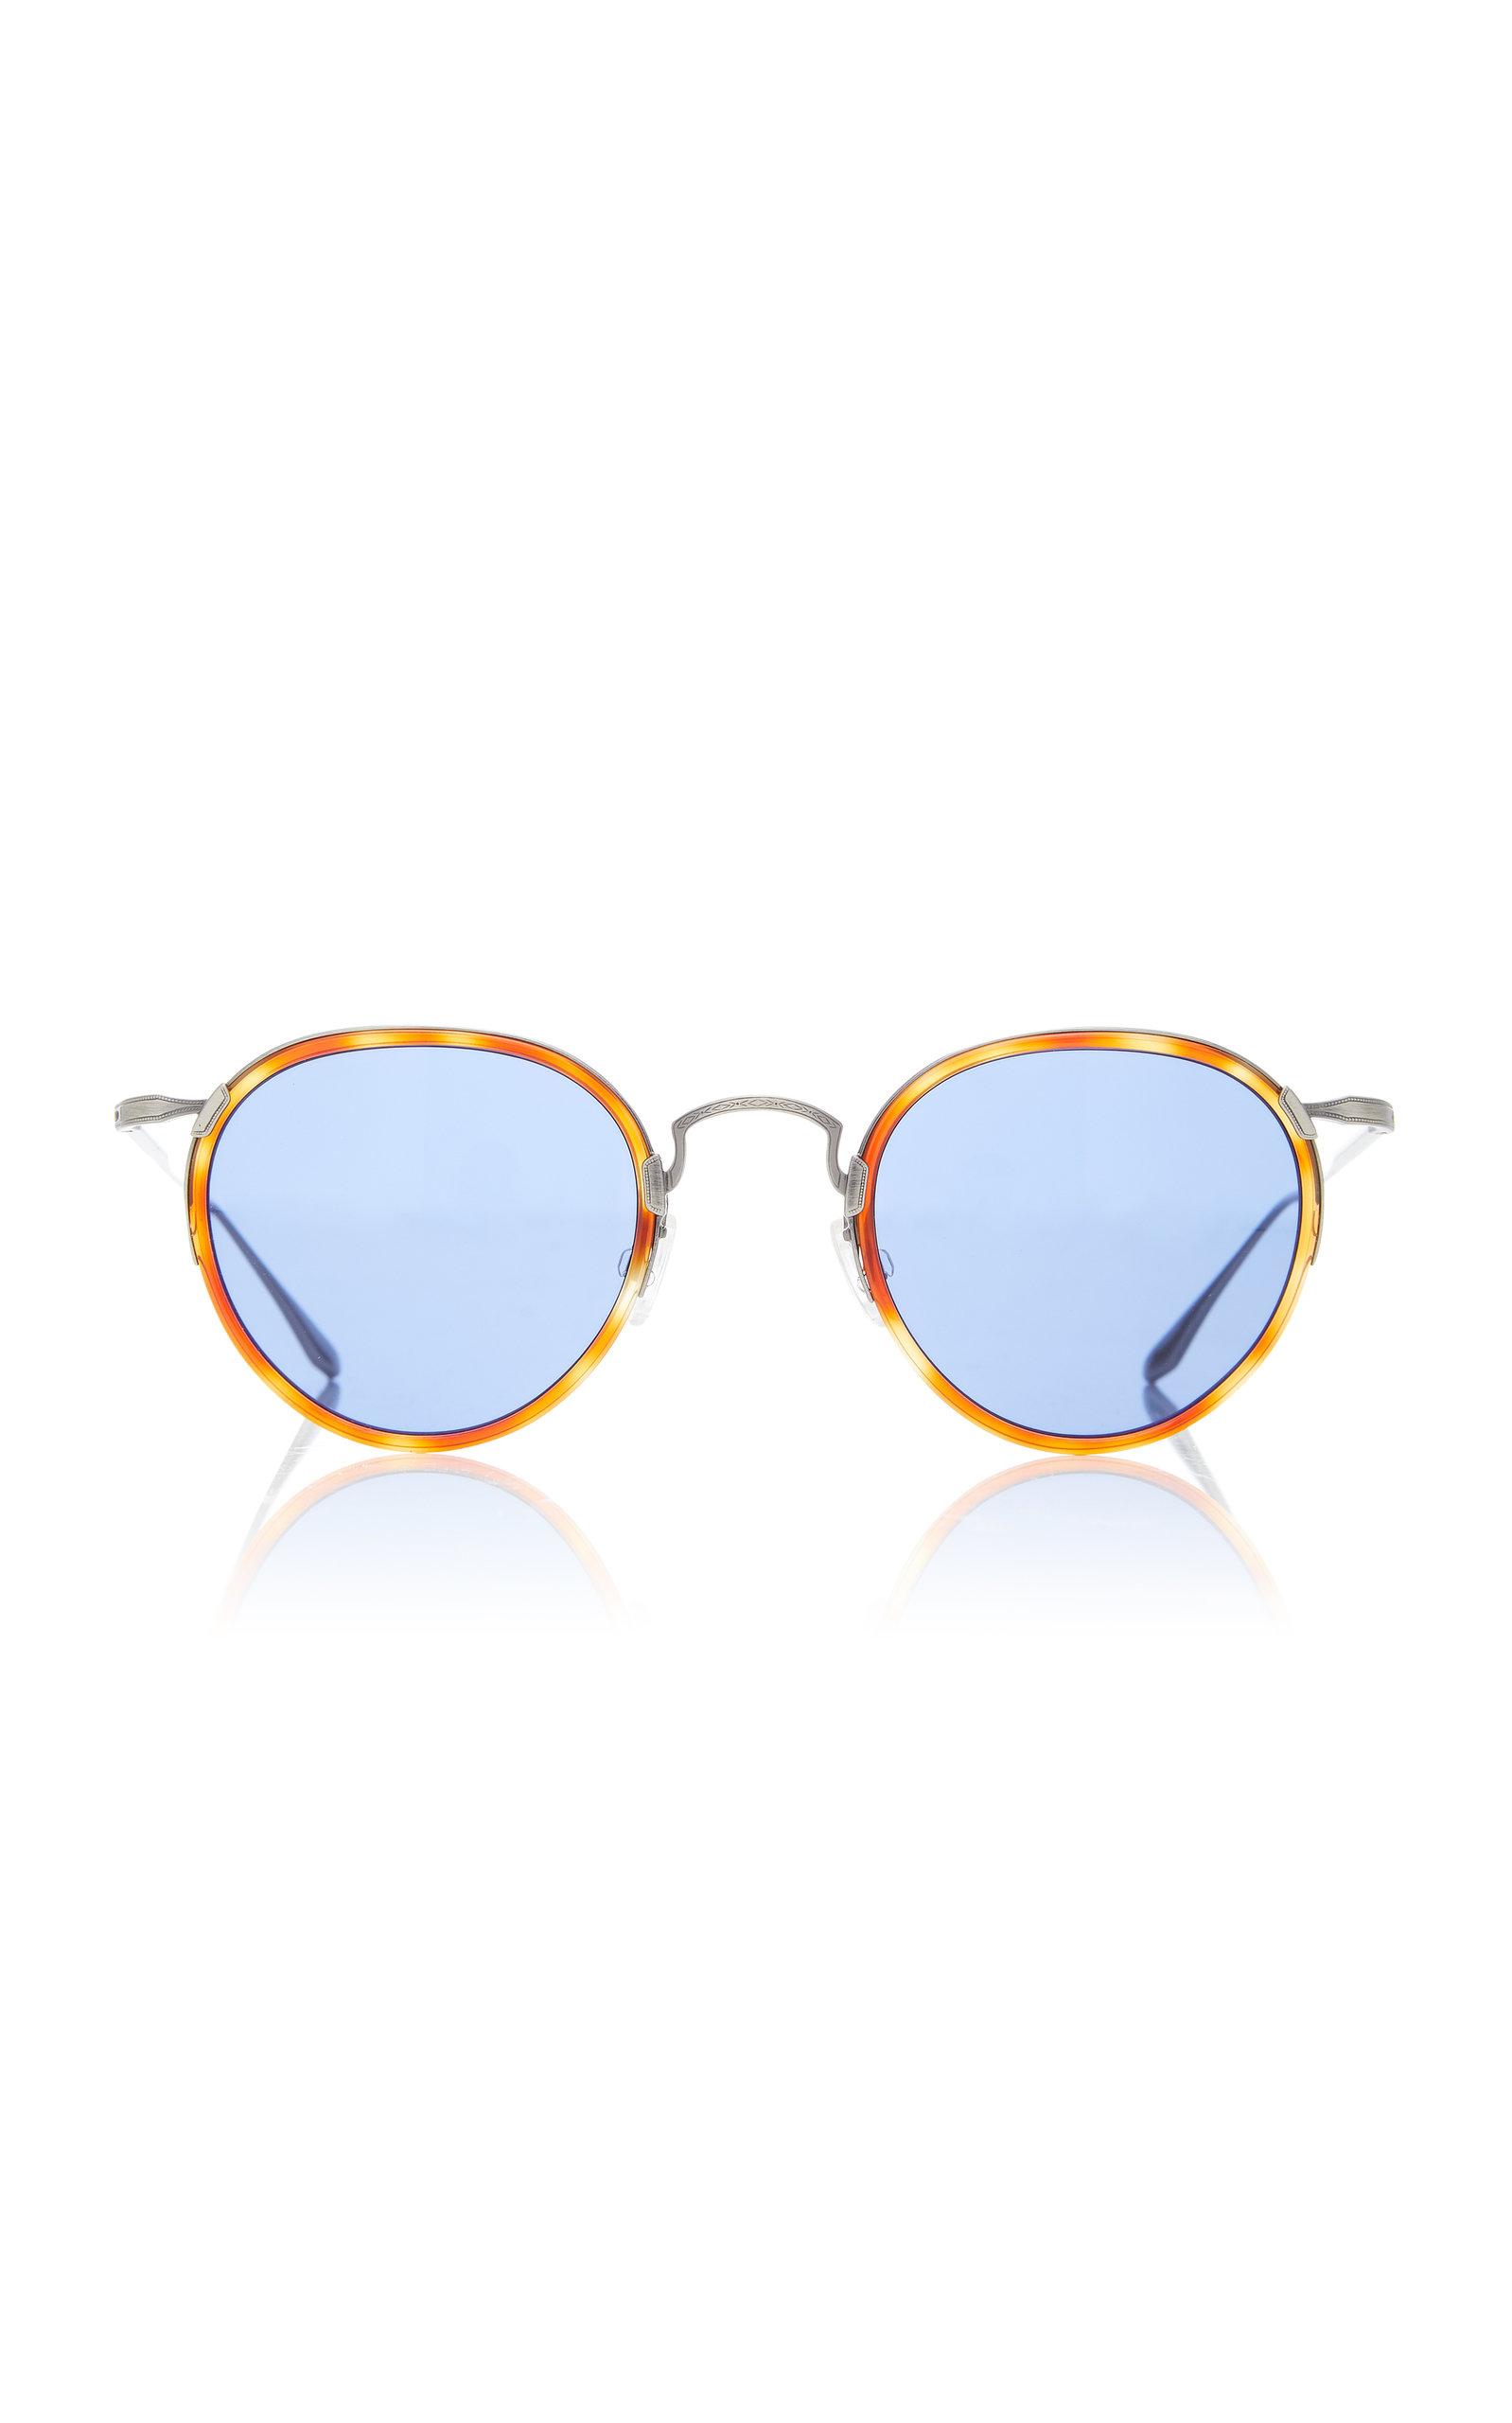 12b02b69b1a3 Barton Perreira Aalto Havana Round Sunglasses In Orange